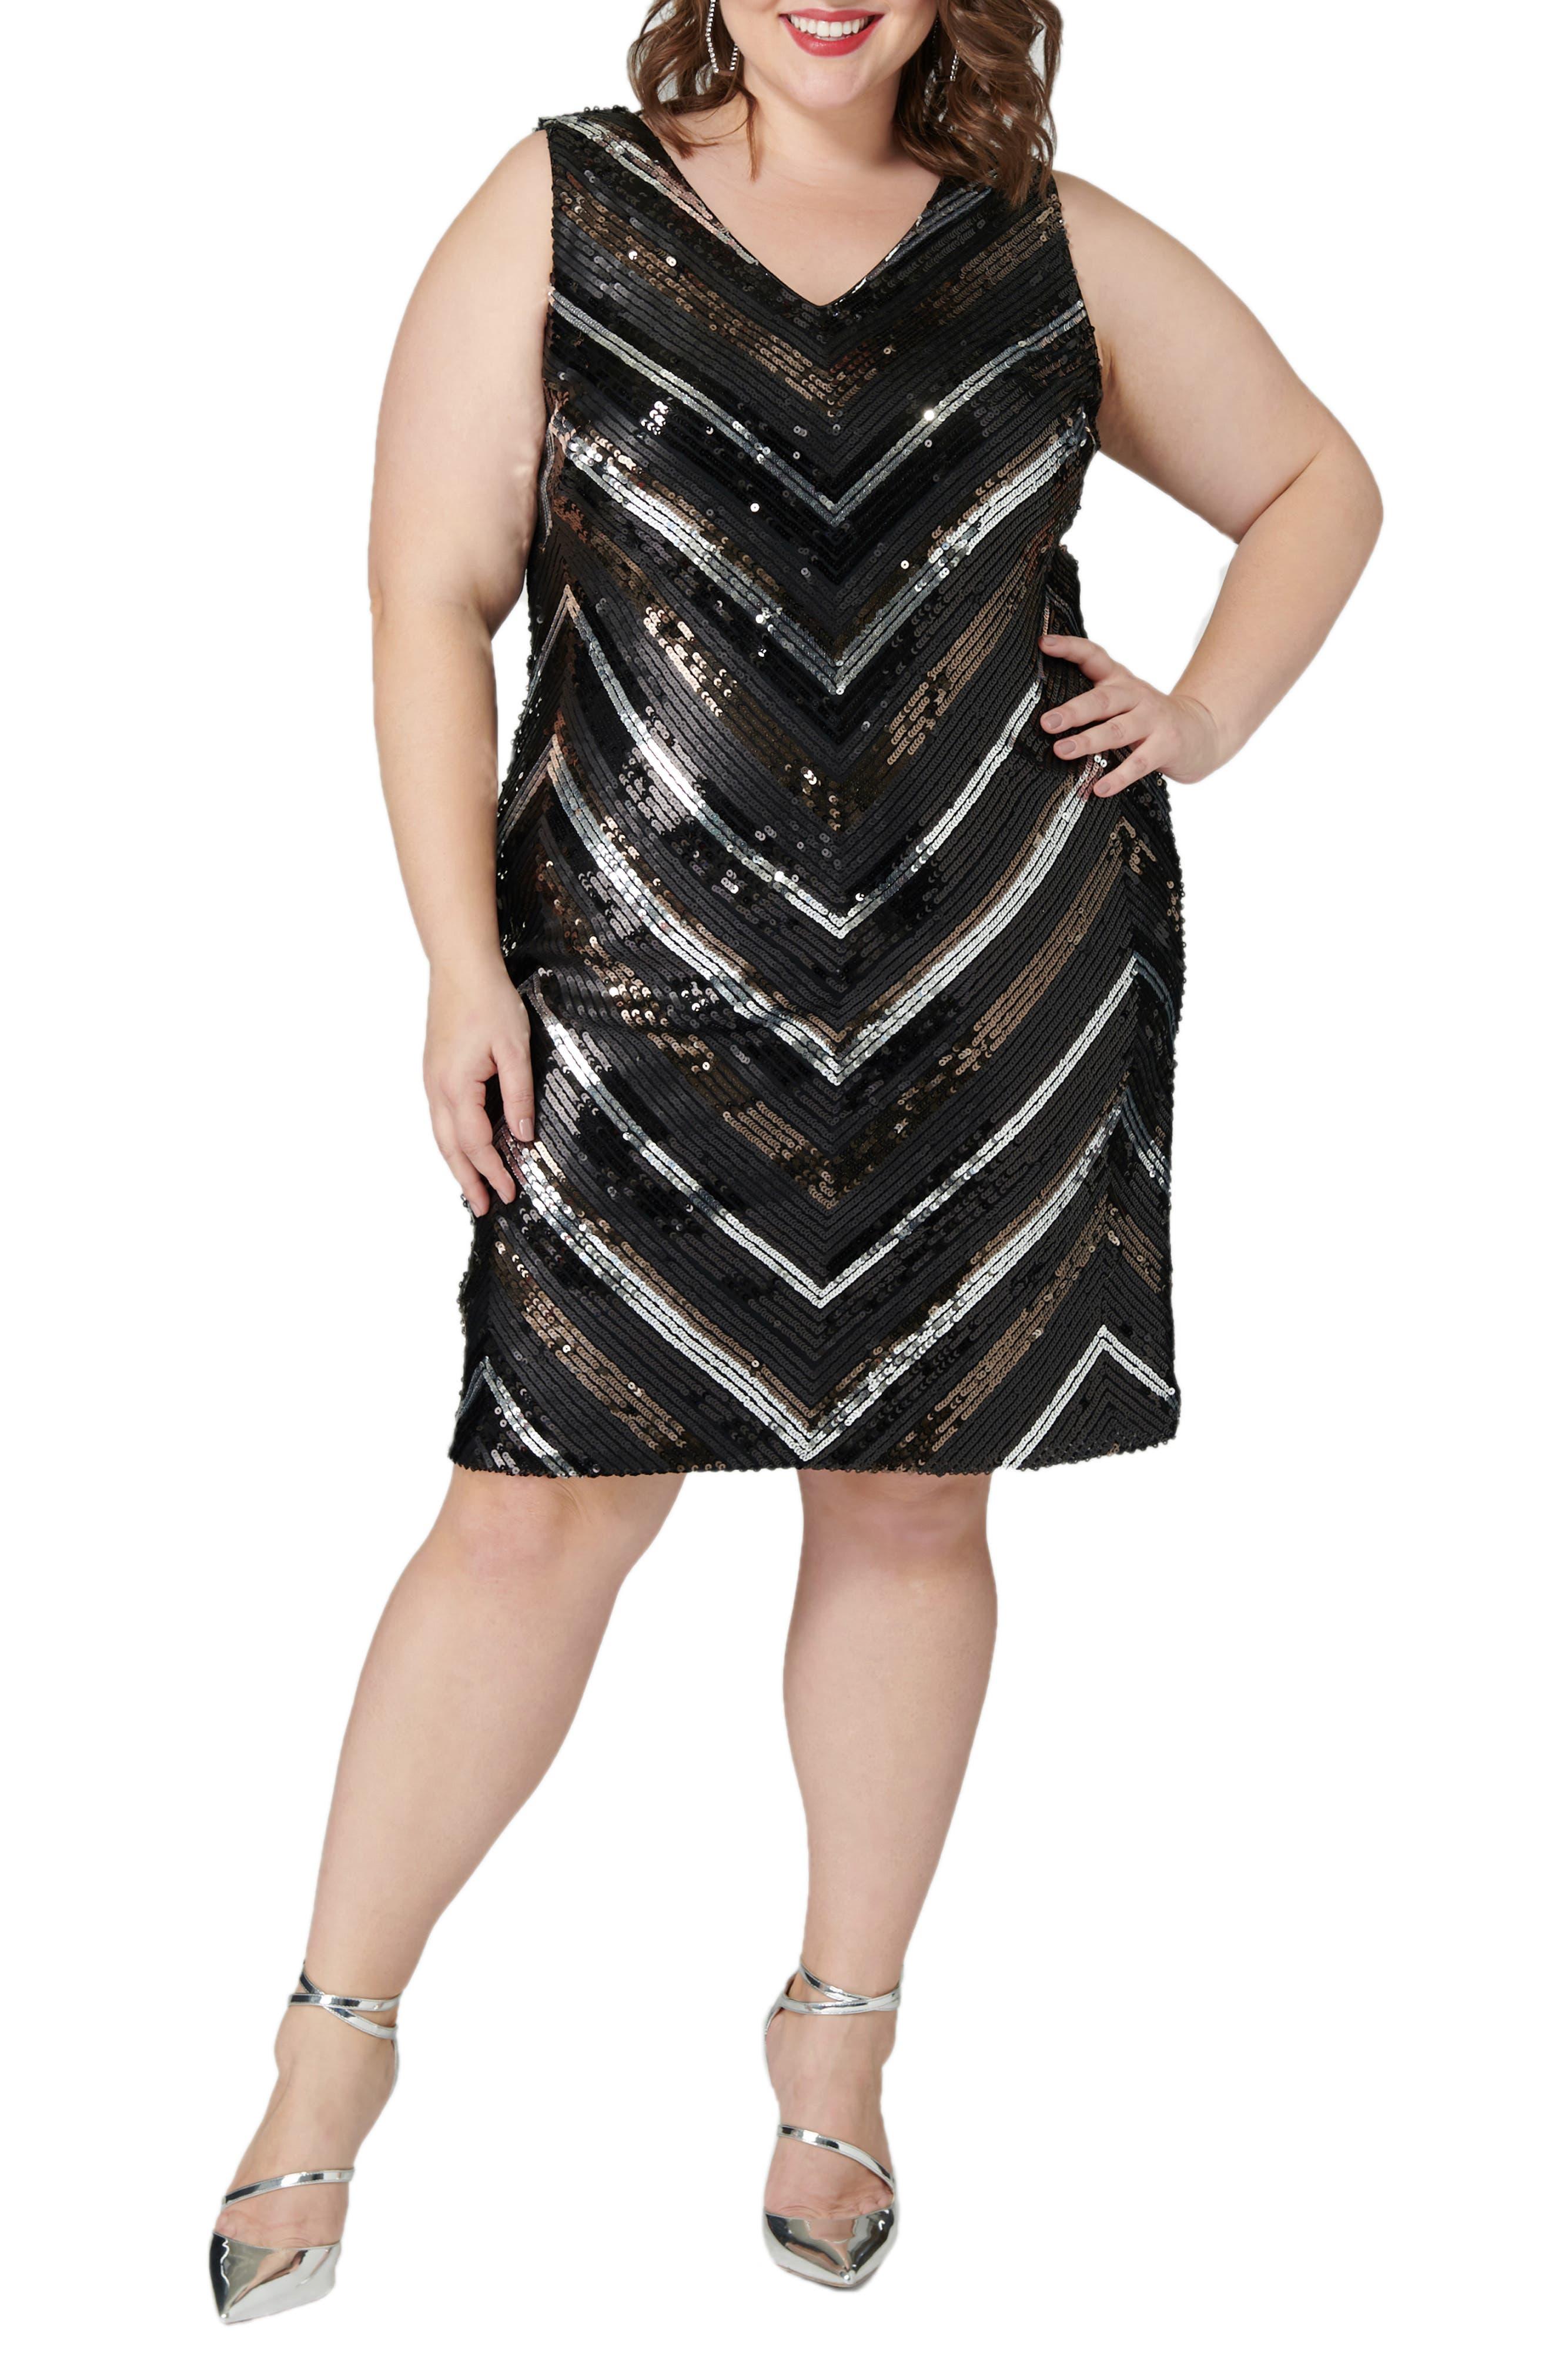 Vintage 1920s Dresses – Where to Buy Plus Size Womens Maree Pour Toi Sequin Sheath Dress $159.00 AT vintagedancer.com